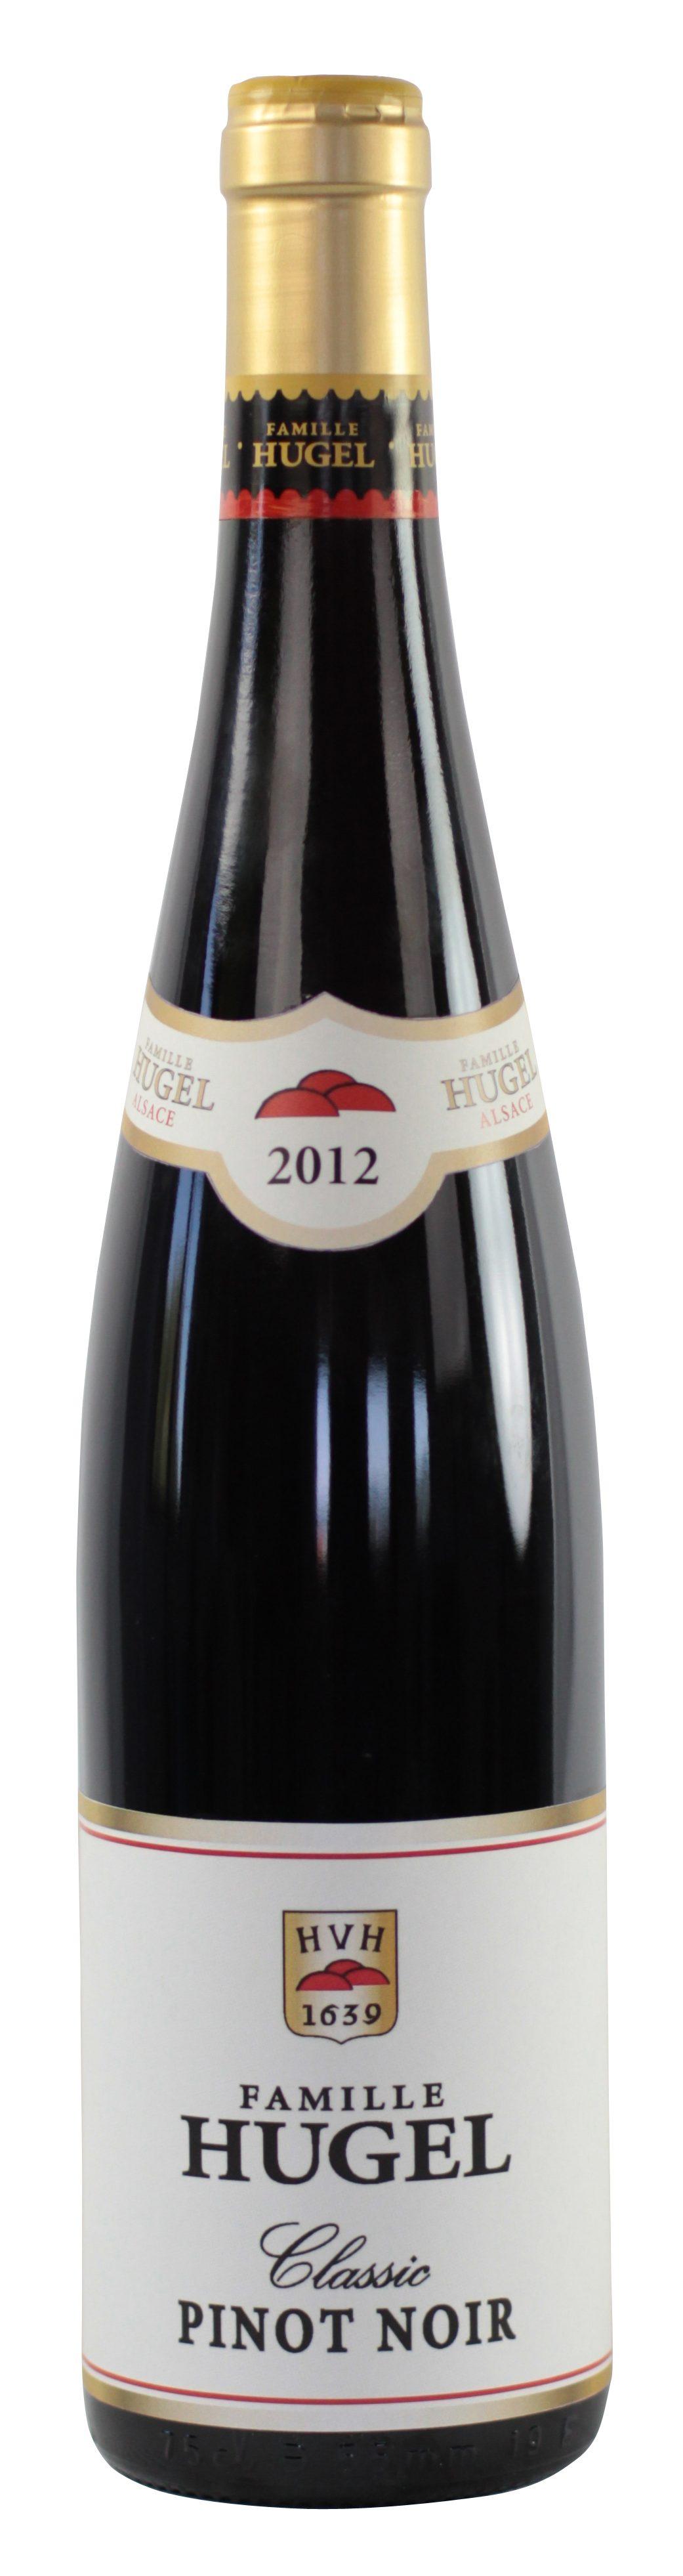 Famille hugel classic pinot noir 2012